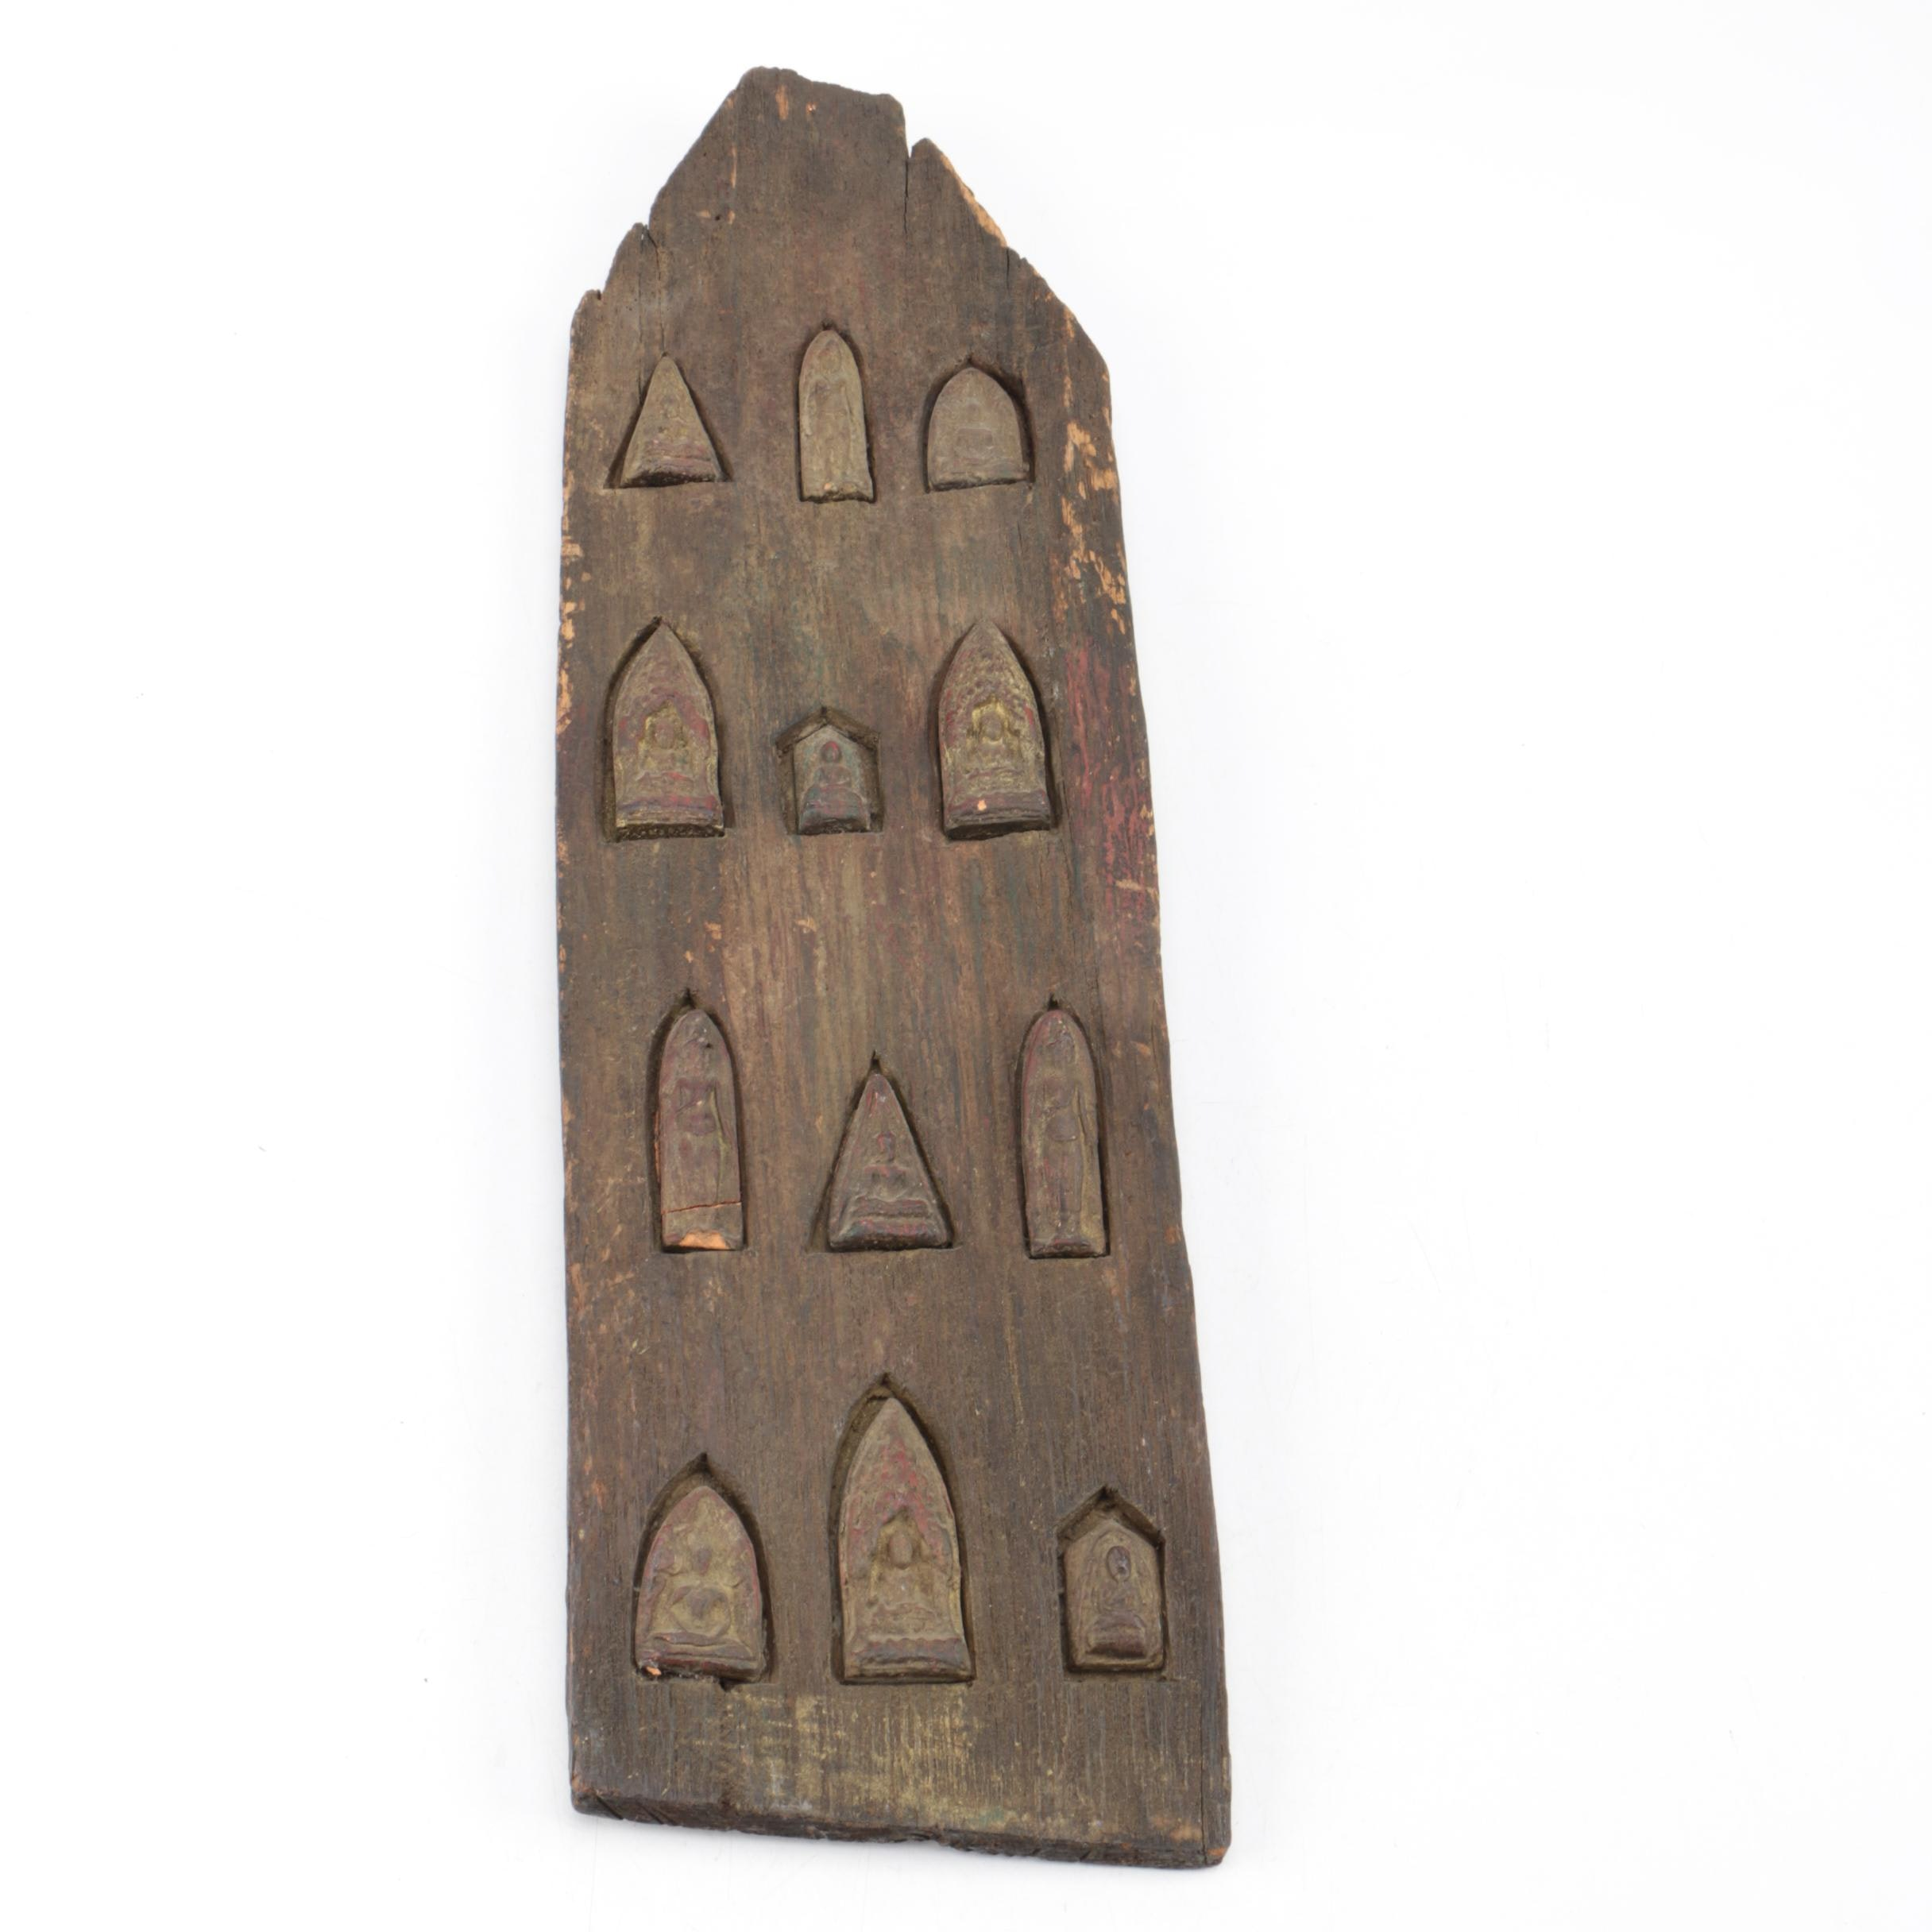 Antique Wooden Carving depicting Meditative Poses